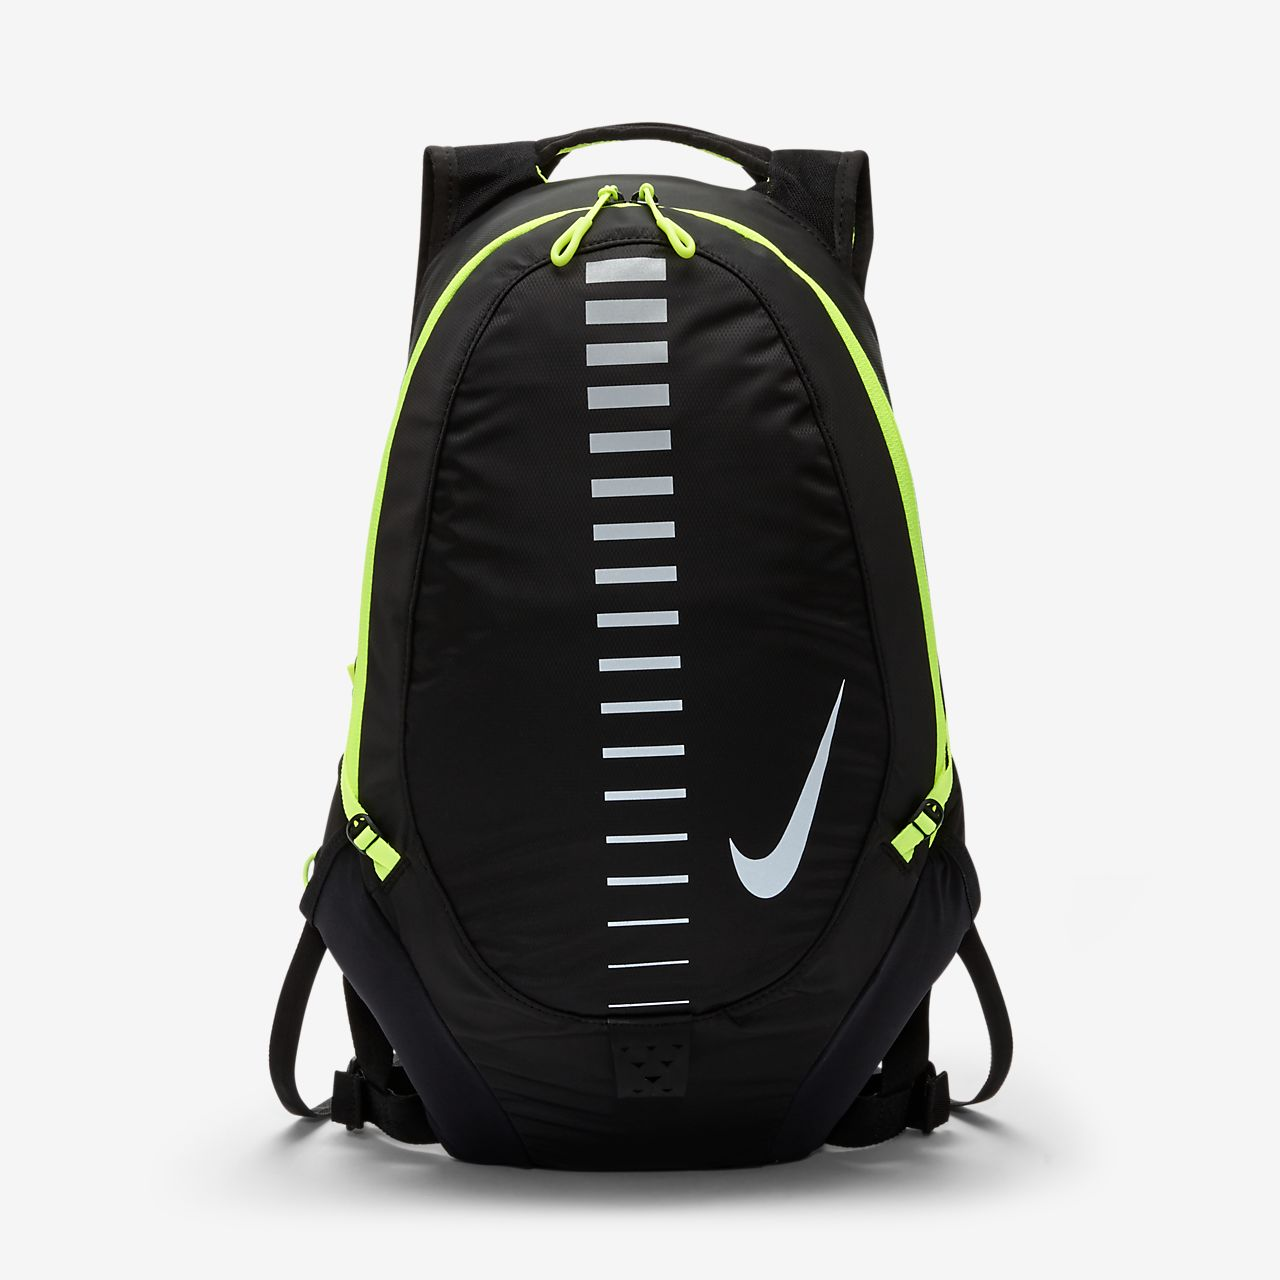 8592b02be7aa5 Plecak do biegania Nike Commuter ...